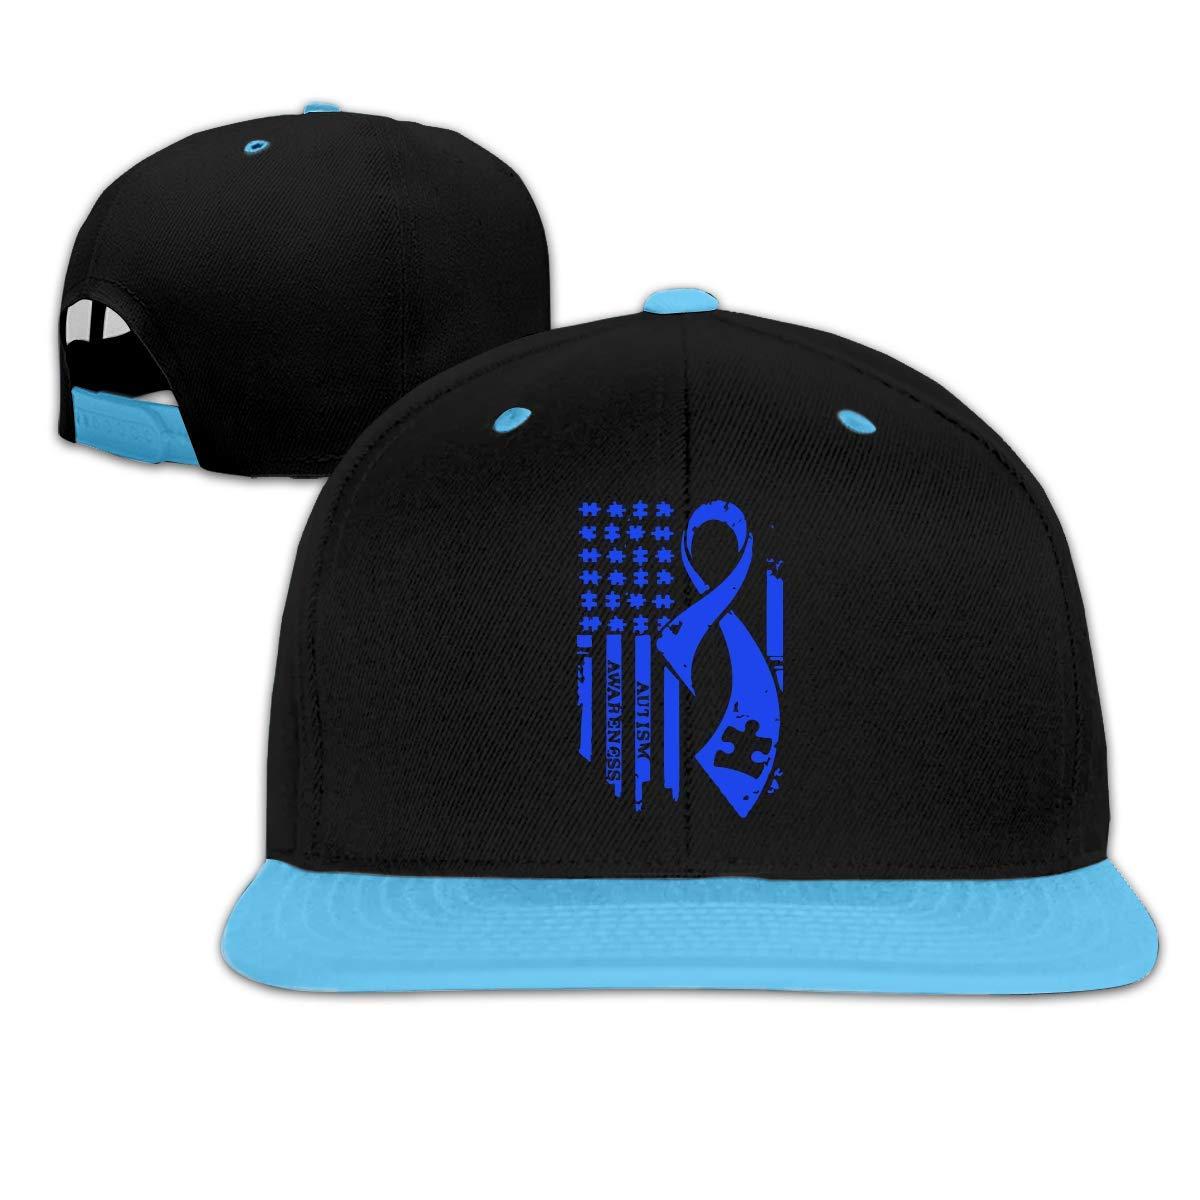 HERSTER Toddler Boys/&Girls Autism Awareness American Flag10 Baseball Cap Hats Trucker Hip Hop Cap